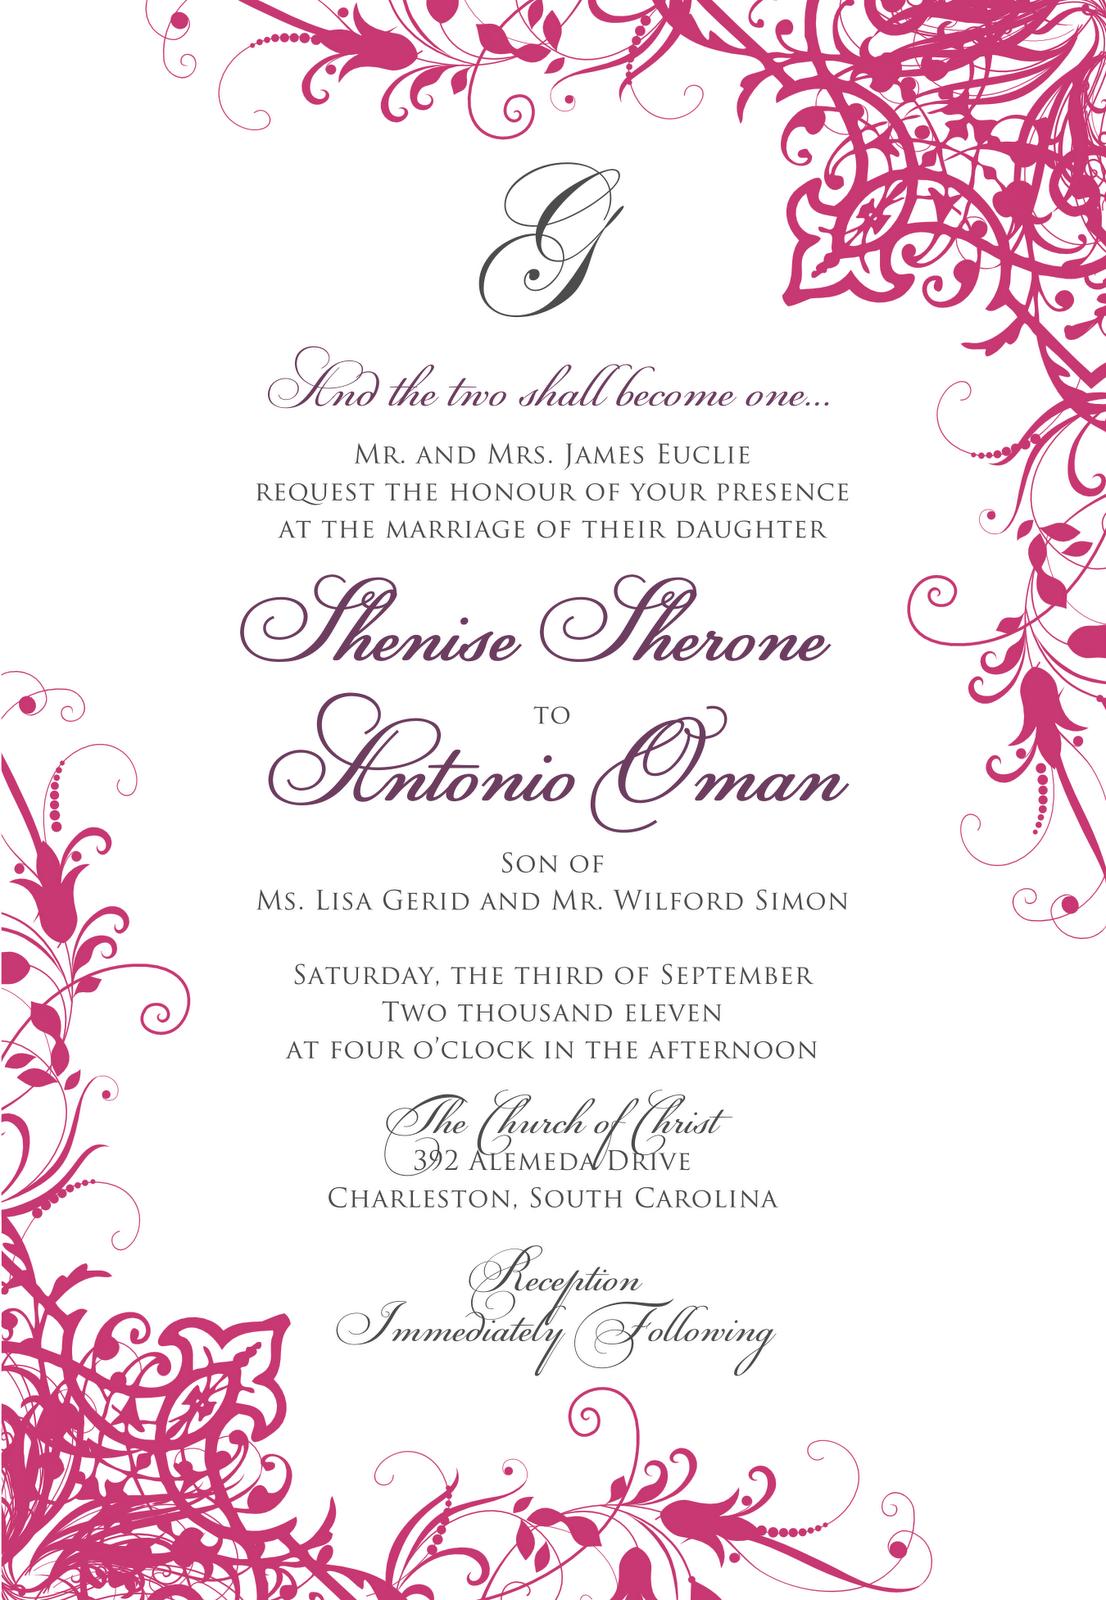 Signatures by Sarah: Wedding Stationery for Atosha